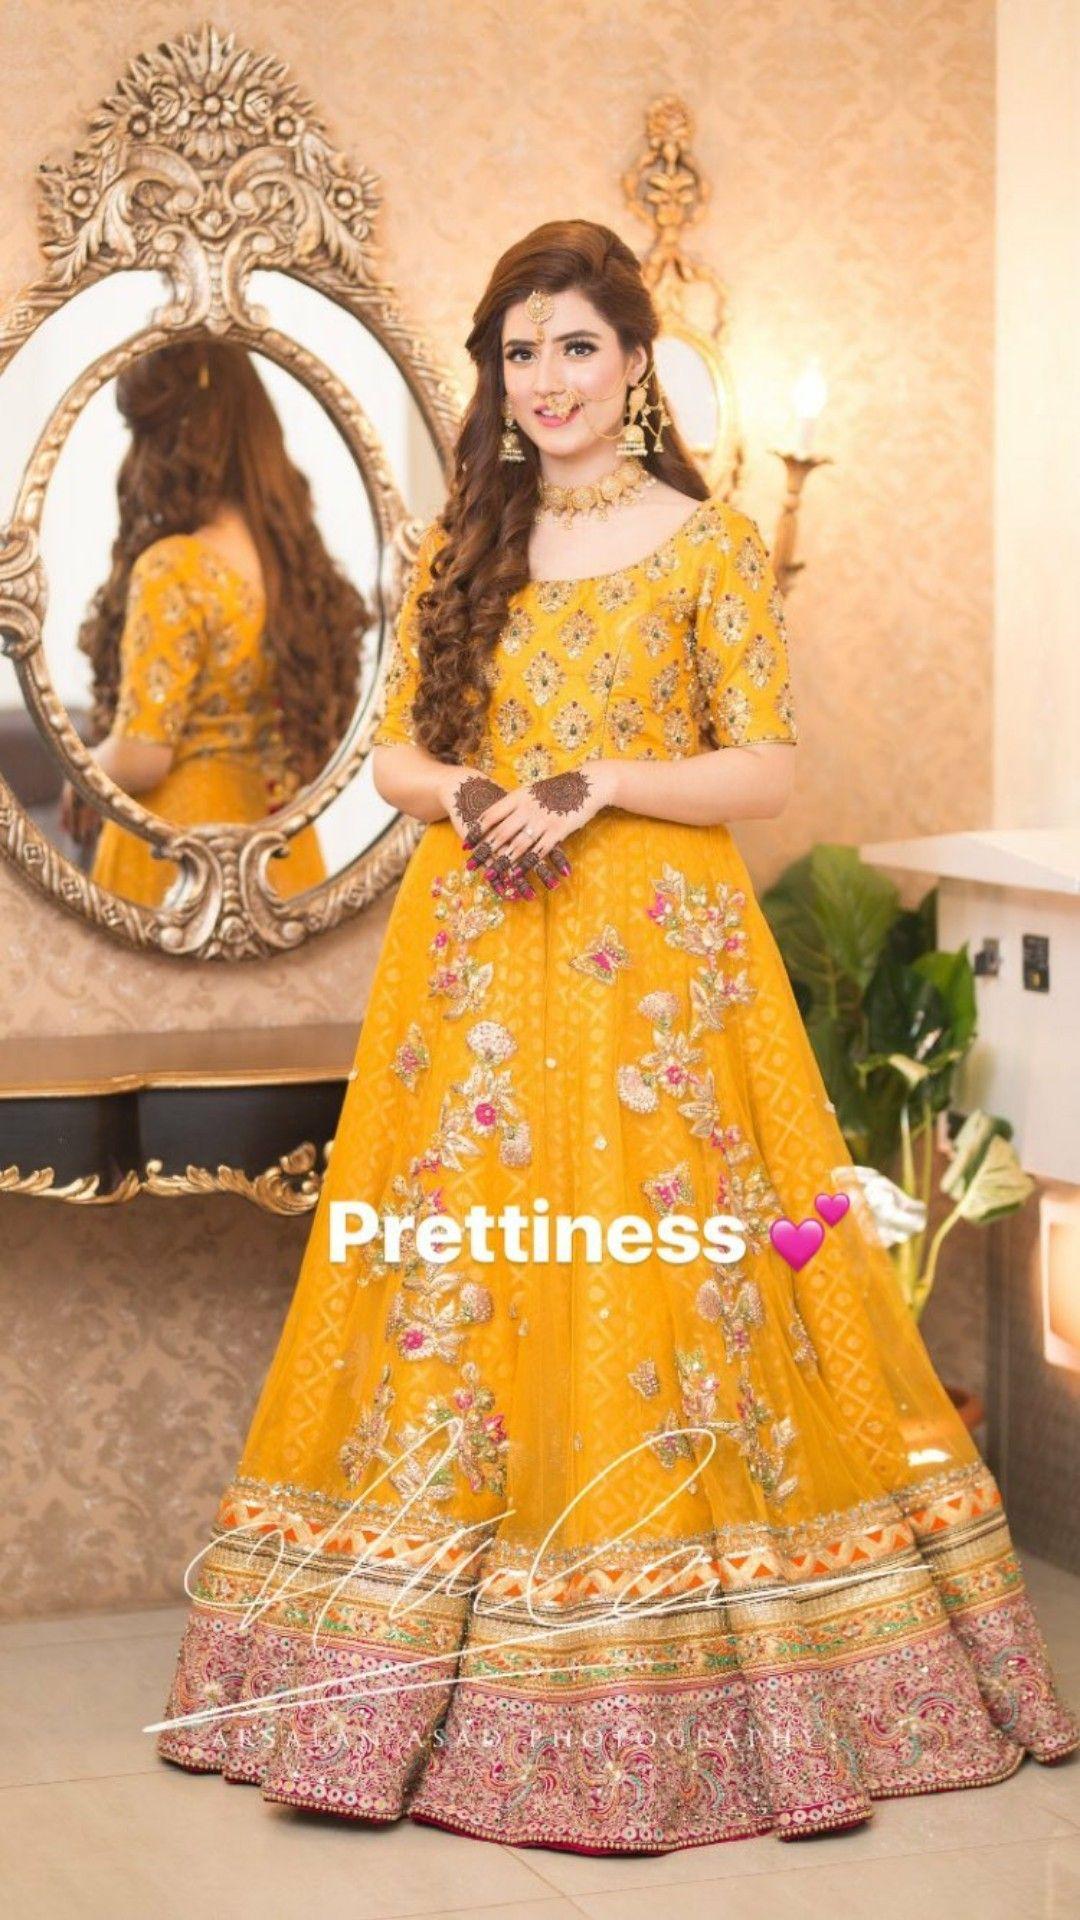 Pretty orange yellow mayoon or mehndi gown in 2019